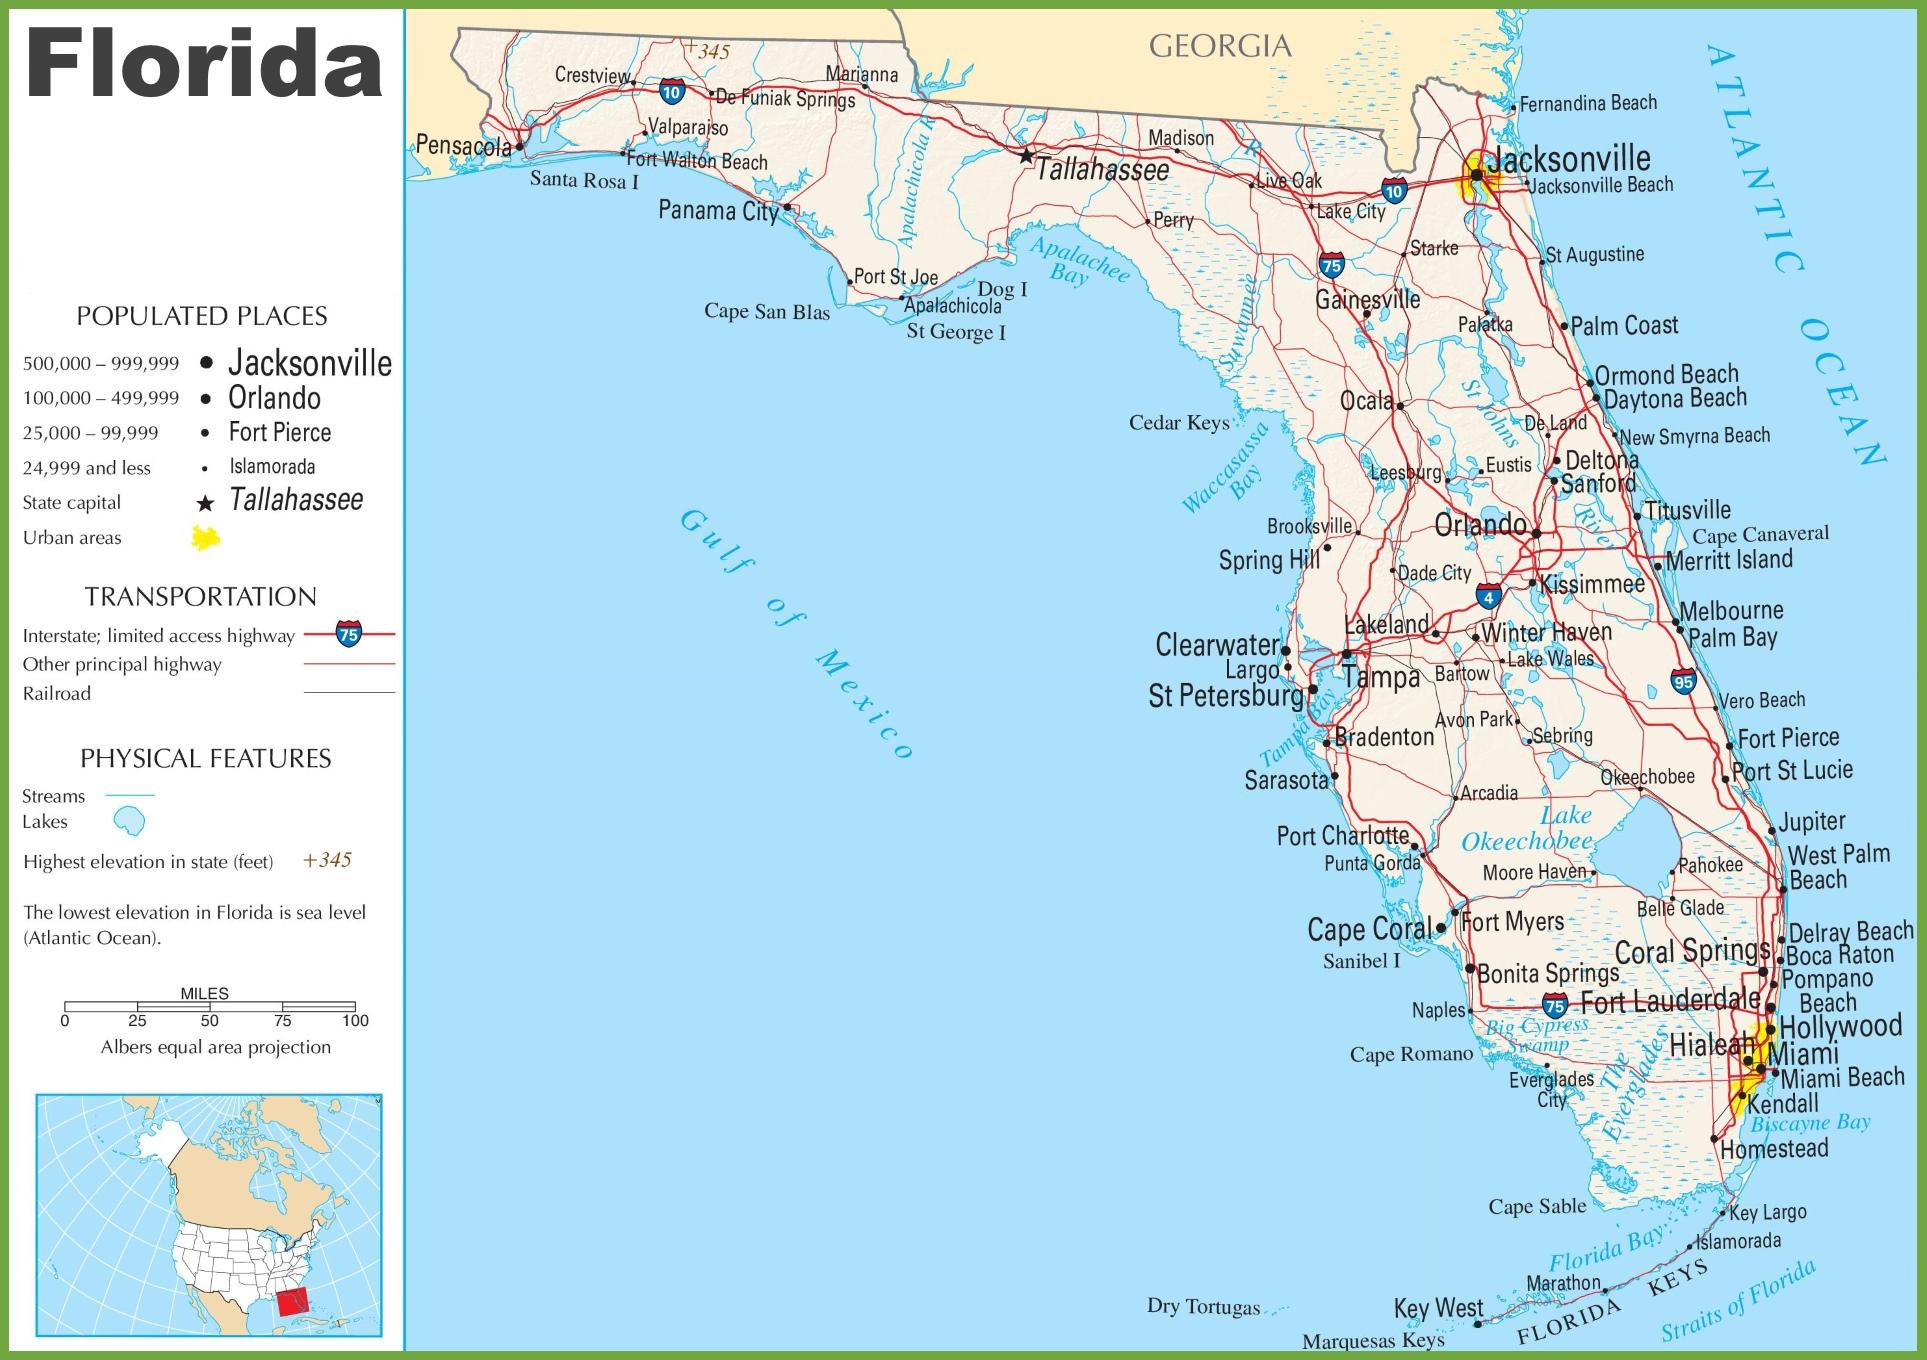 Florida Highway Map - Florida Keys Highway Map